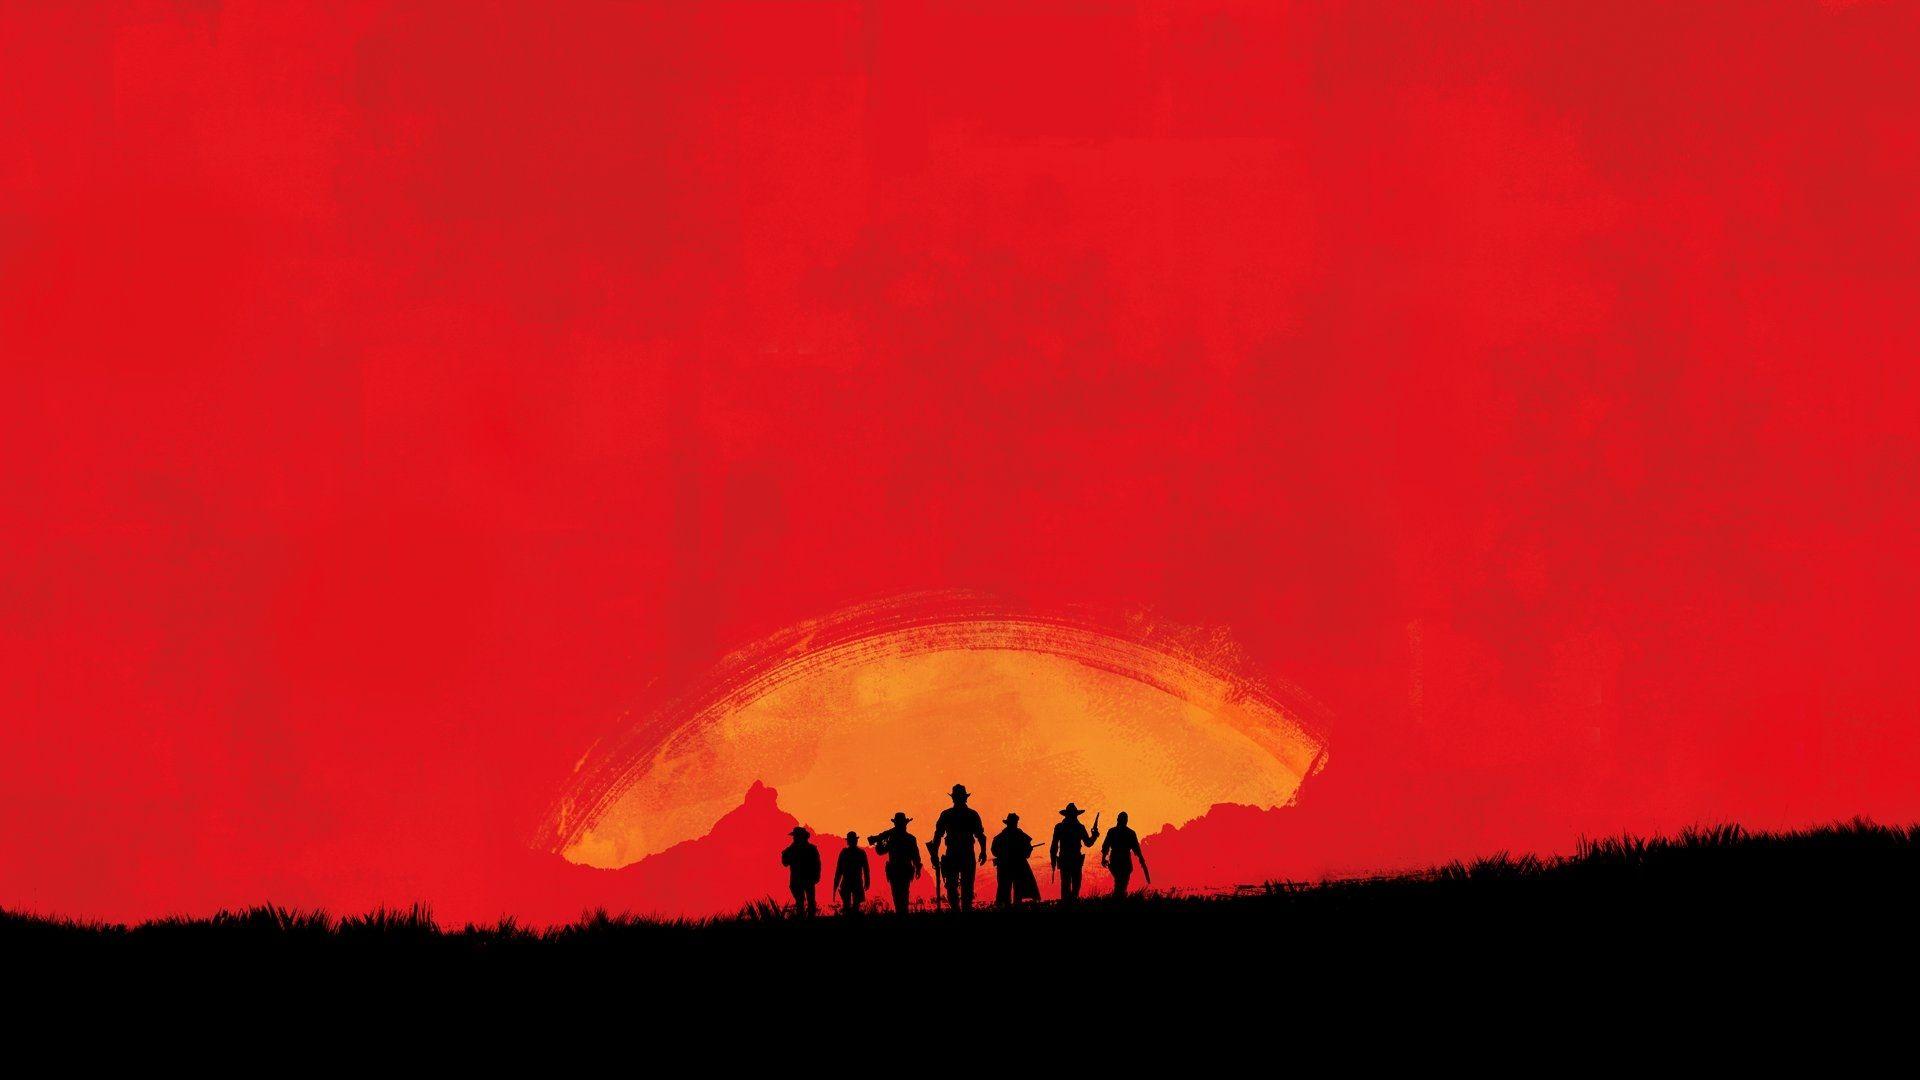 Red Dead Redemption 2 Artwork